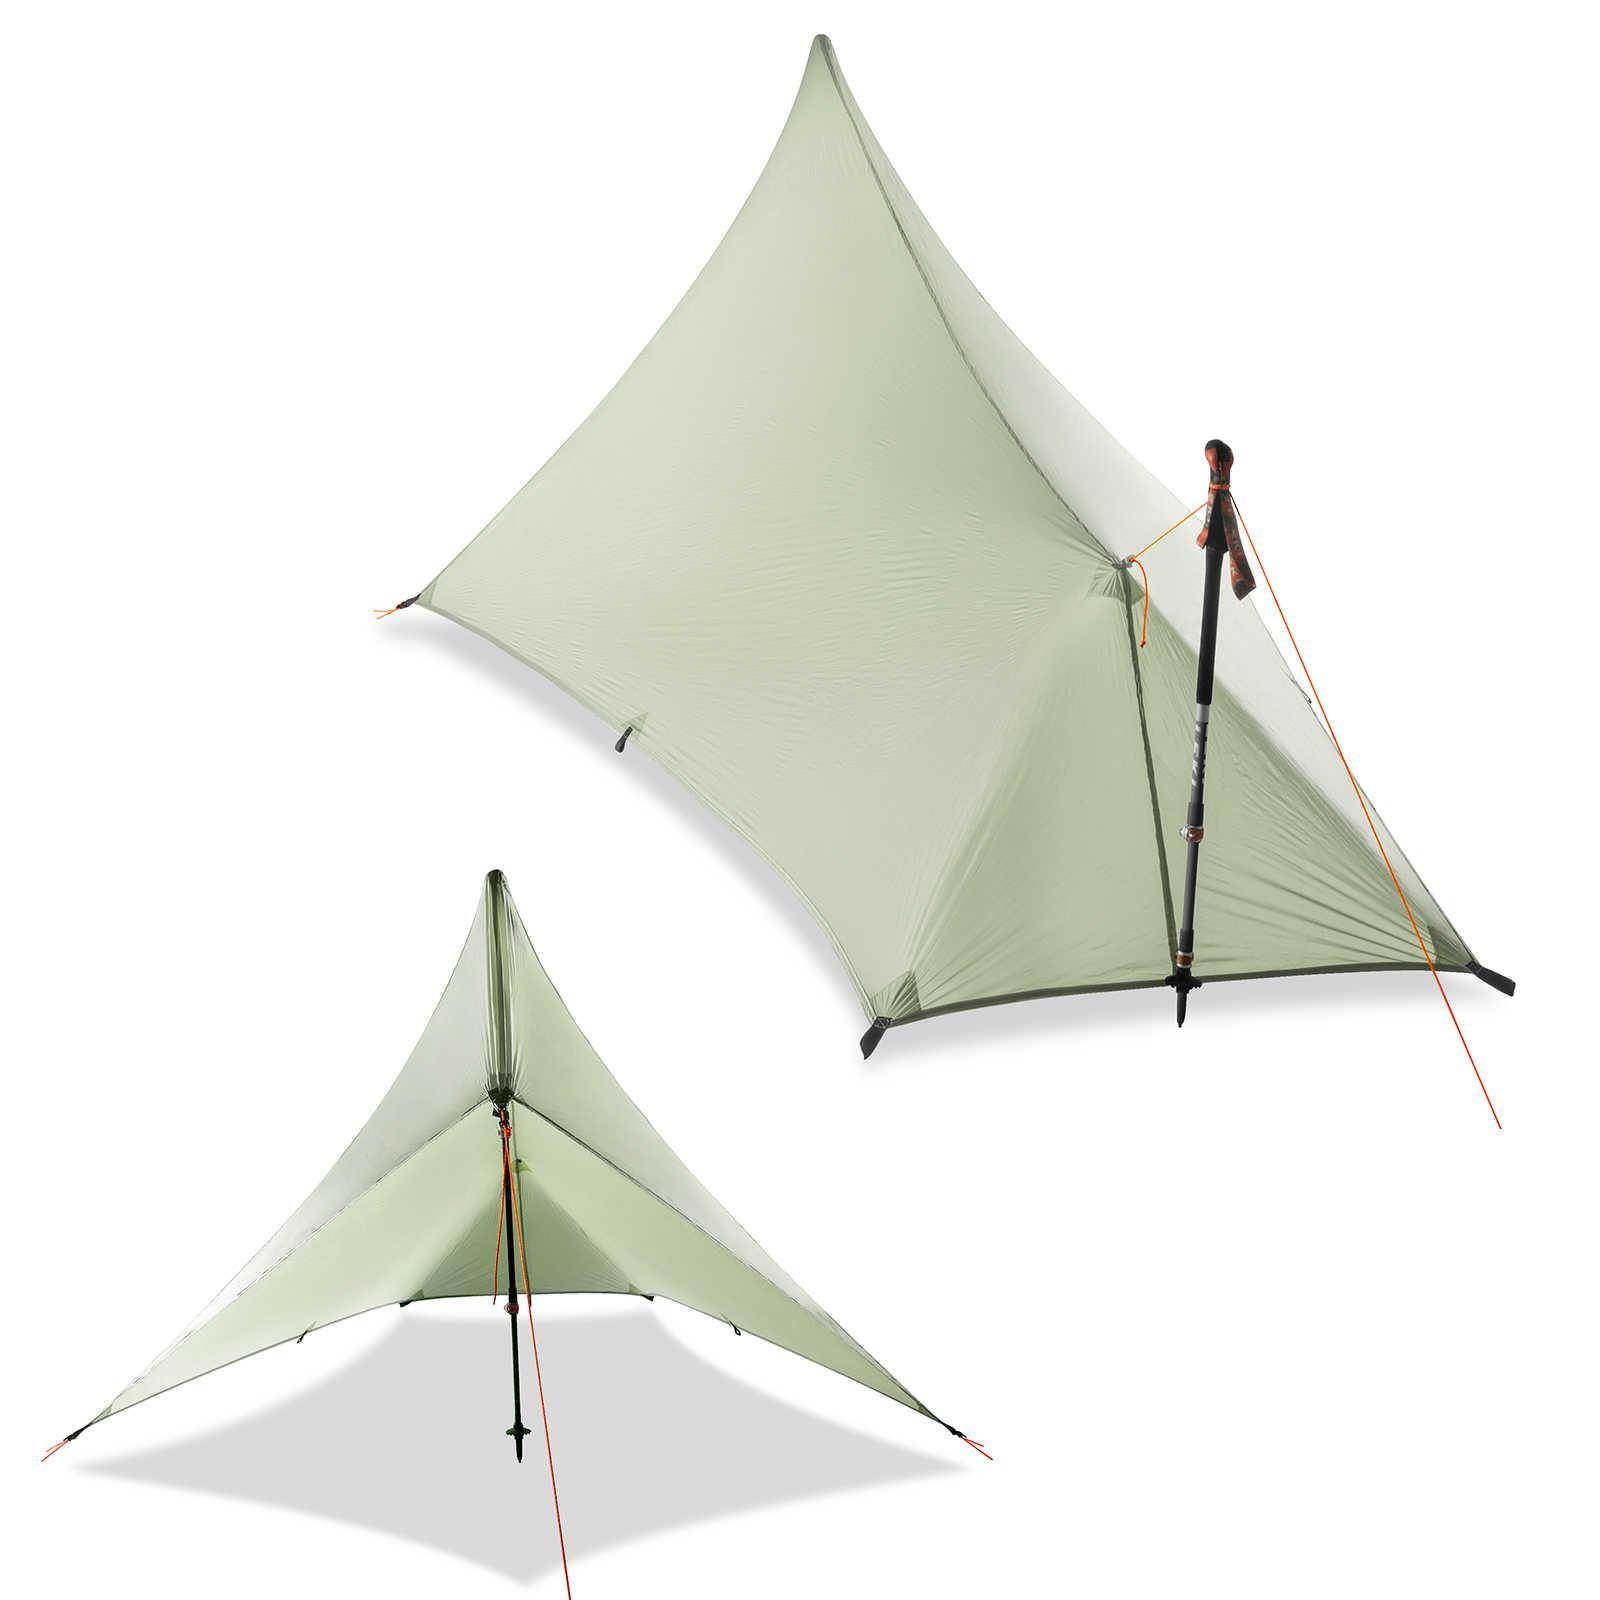 Ultralight 310g Flysheet namiot wodoodporny 20D dwustronna powłoka silikonowa Nylon Camping Shelter baldachim Rainfly lekki plandeka